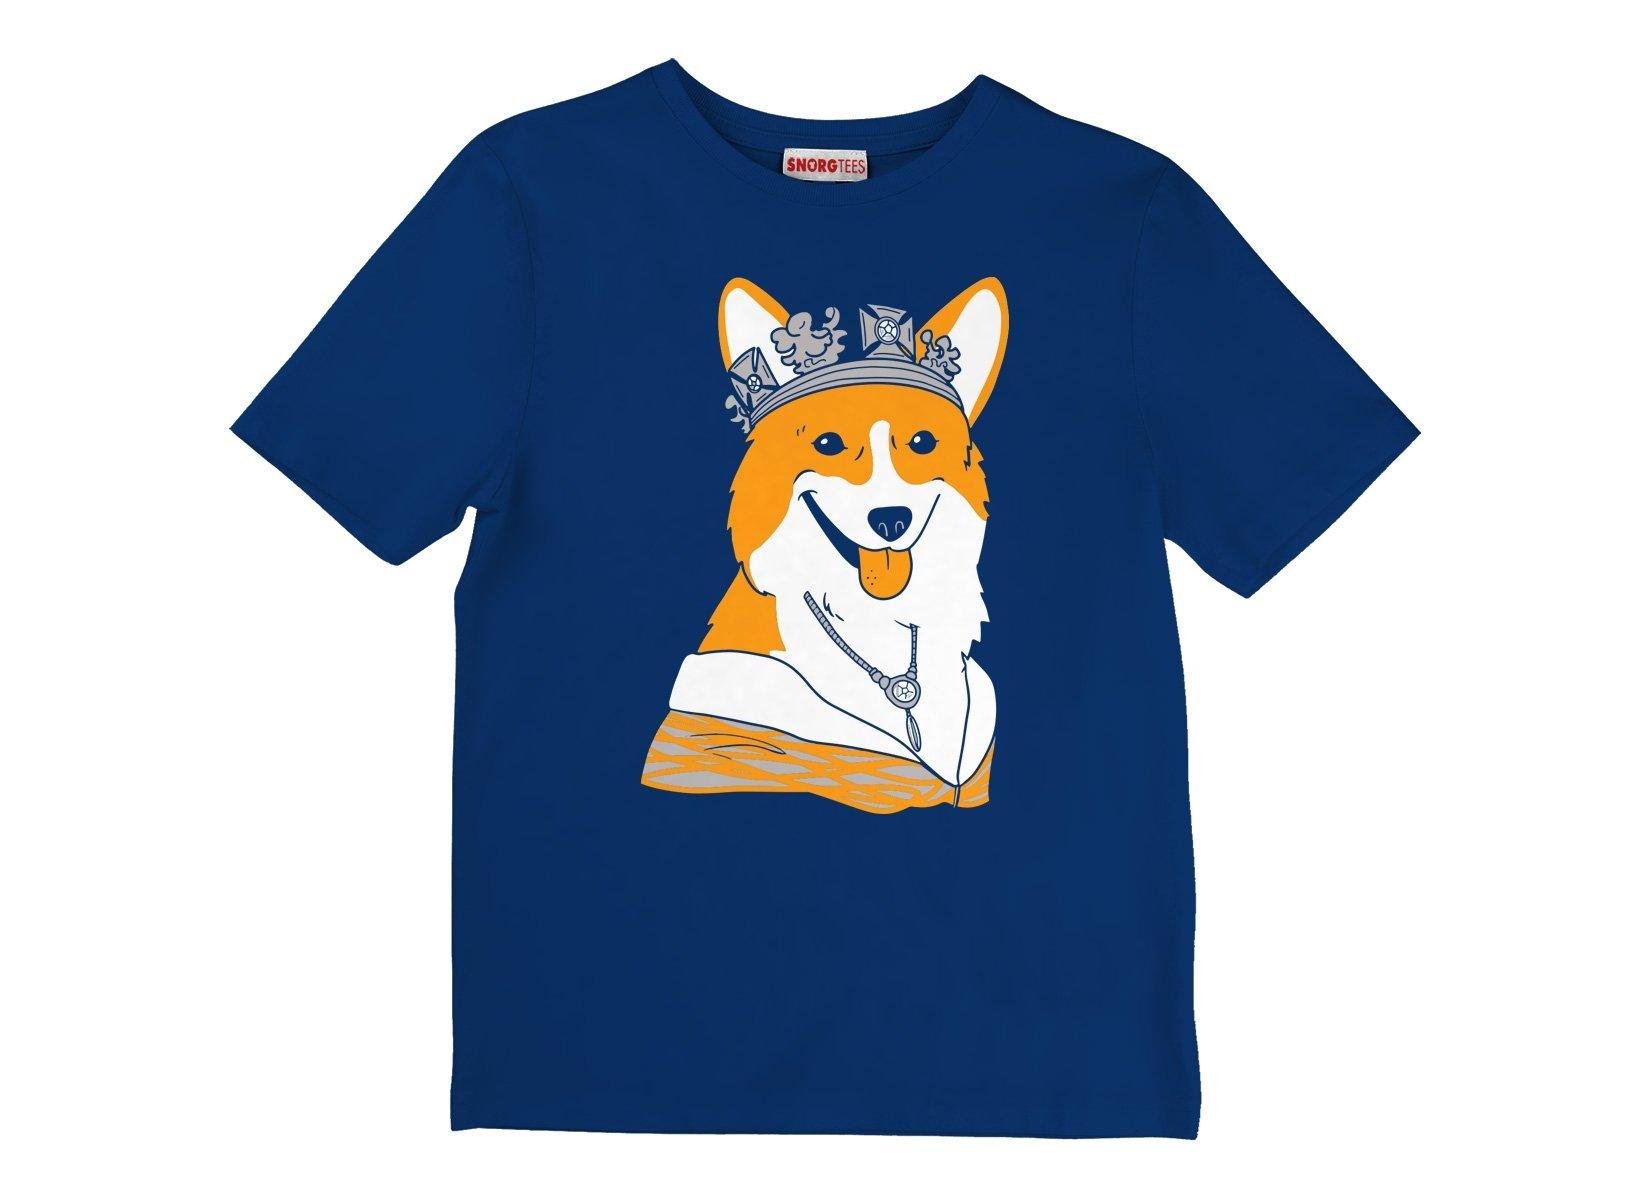 Her Majesty on Kids T-Shirt